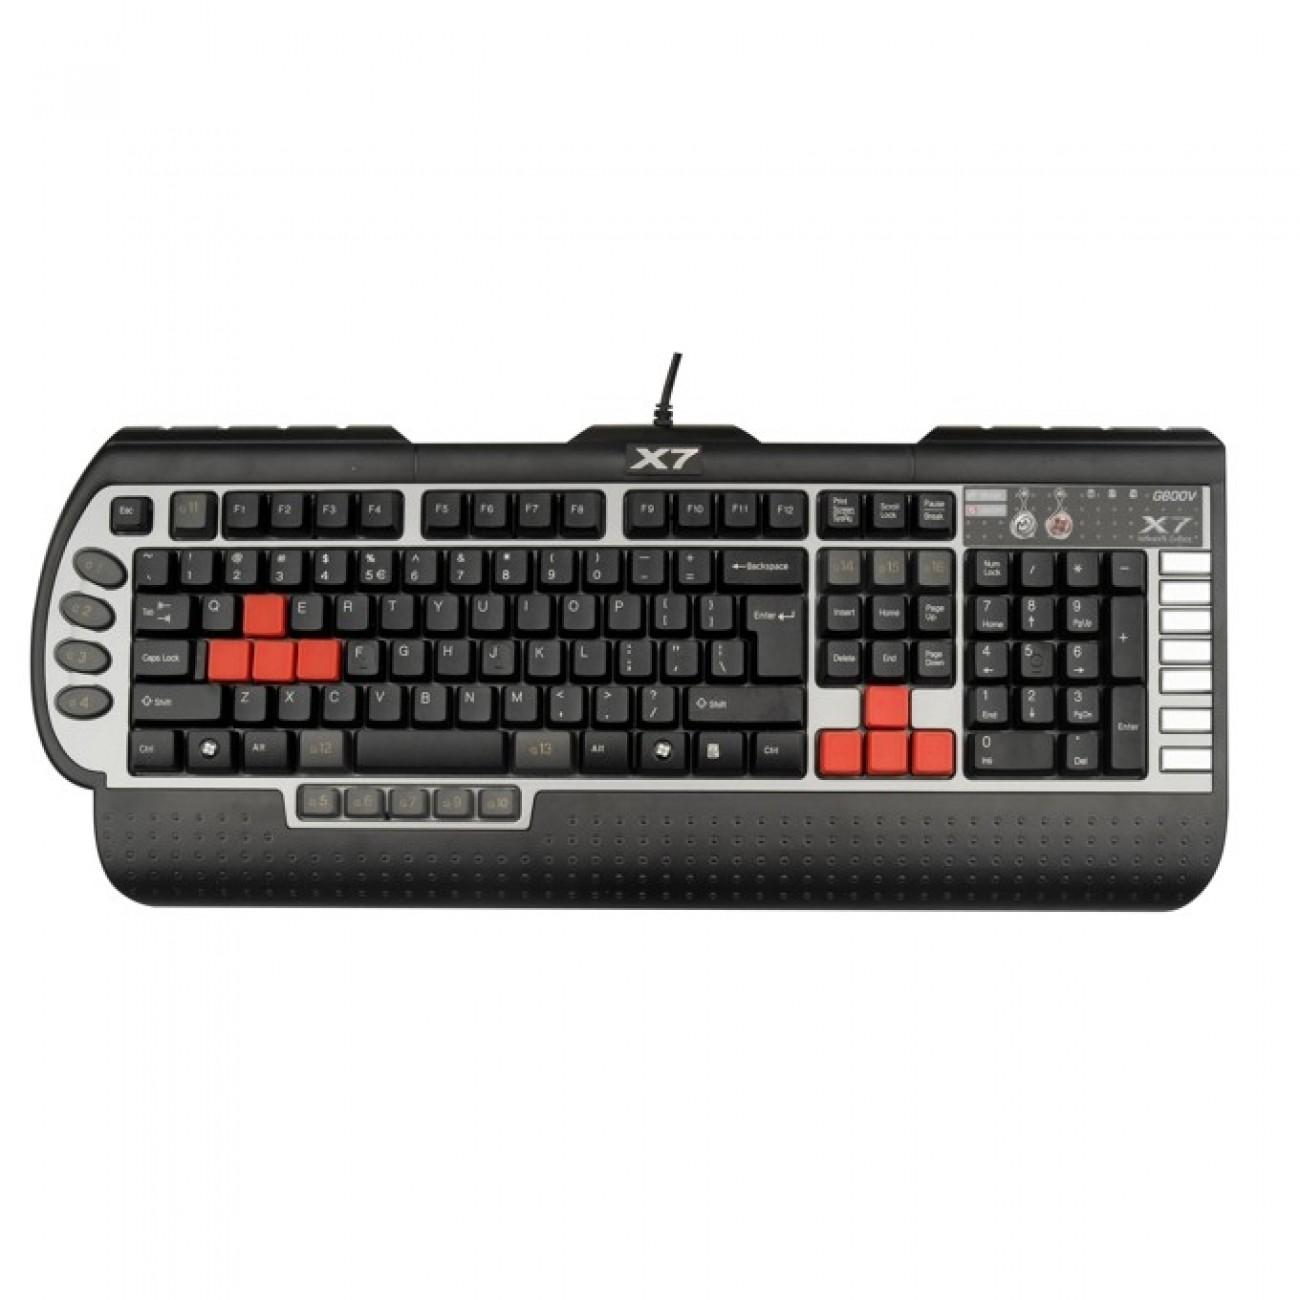 Клавиатура A4Tech G800V Gaming, 15 програмируеми бутона, макроси, USB в Клавиатури -  | Alleop